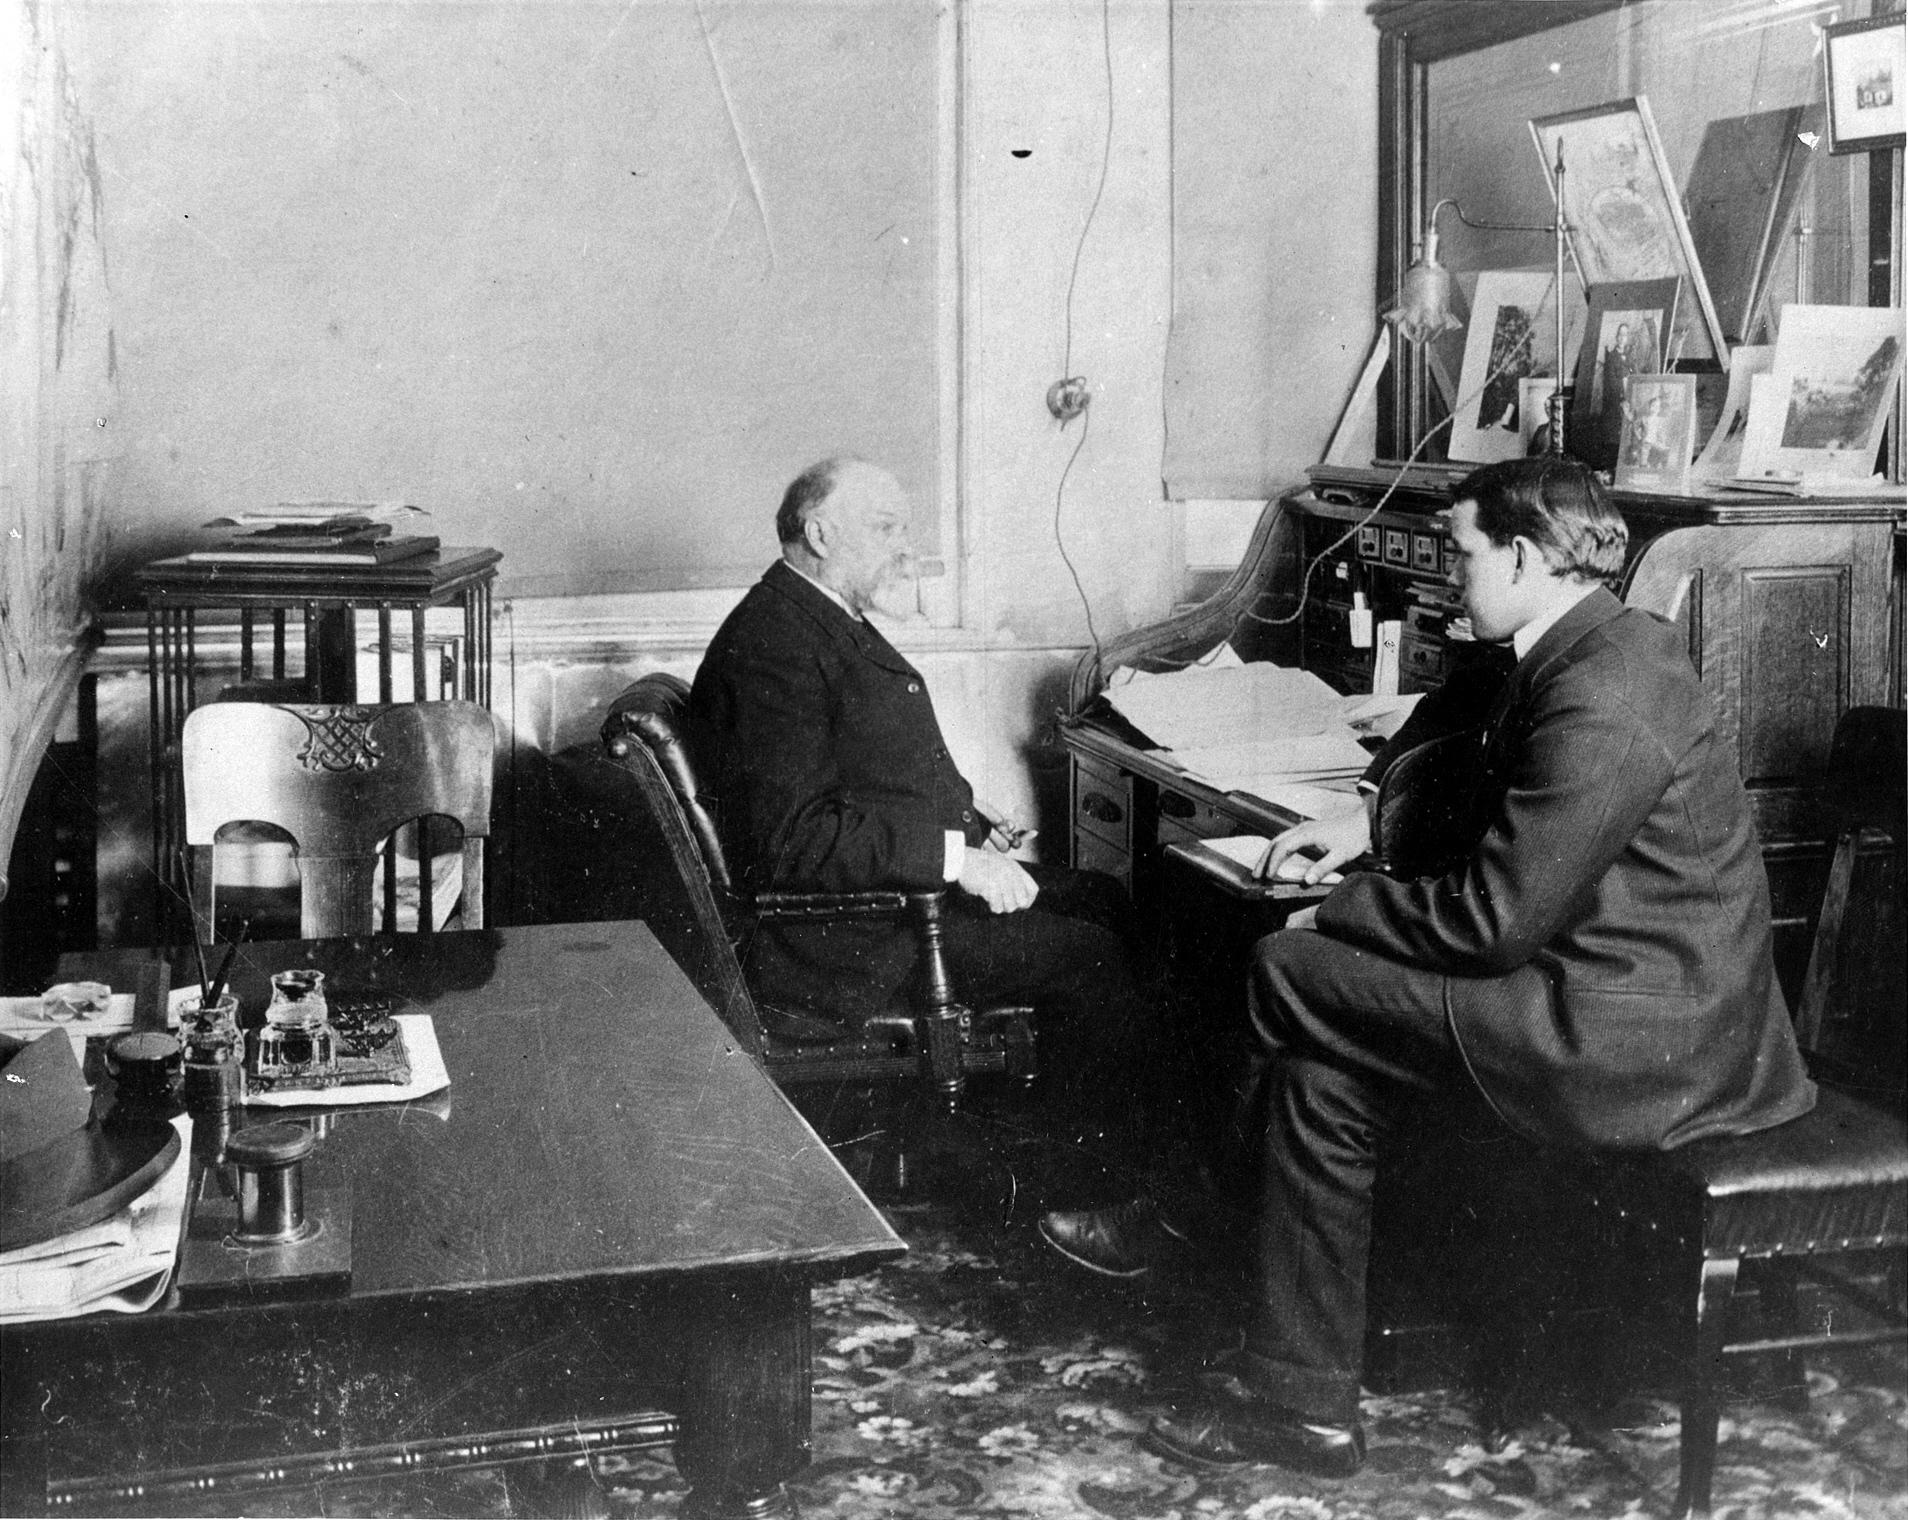 Lens Mills Store Kitchener